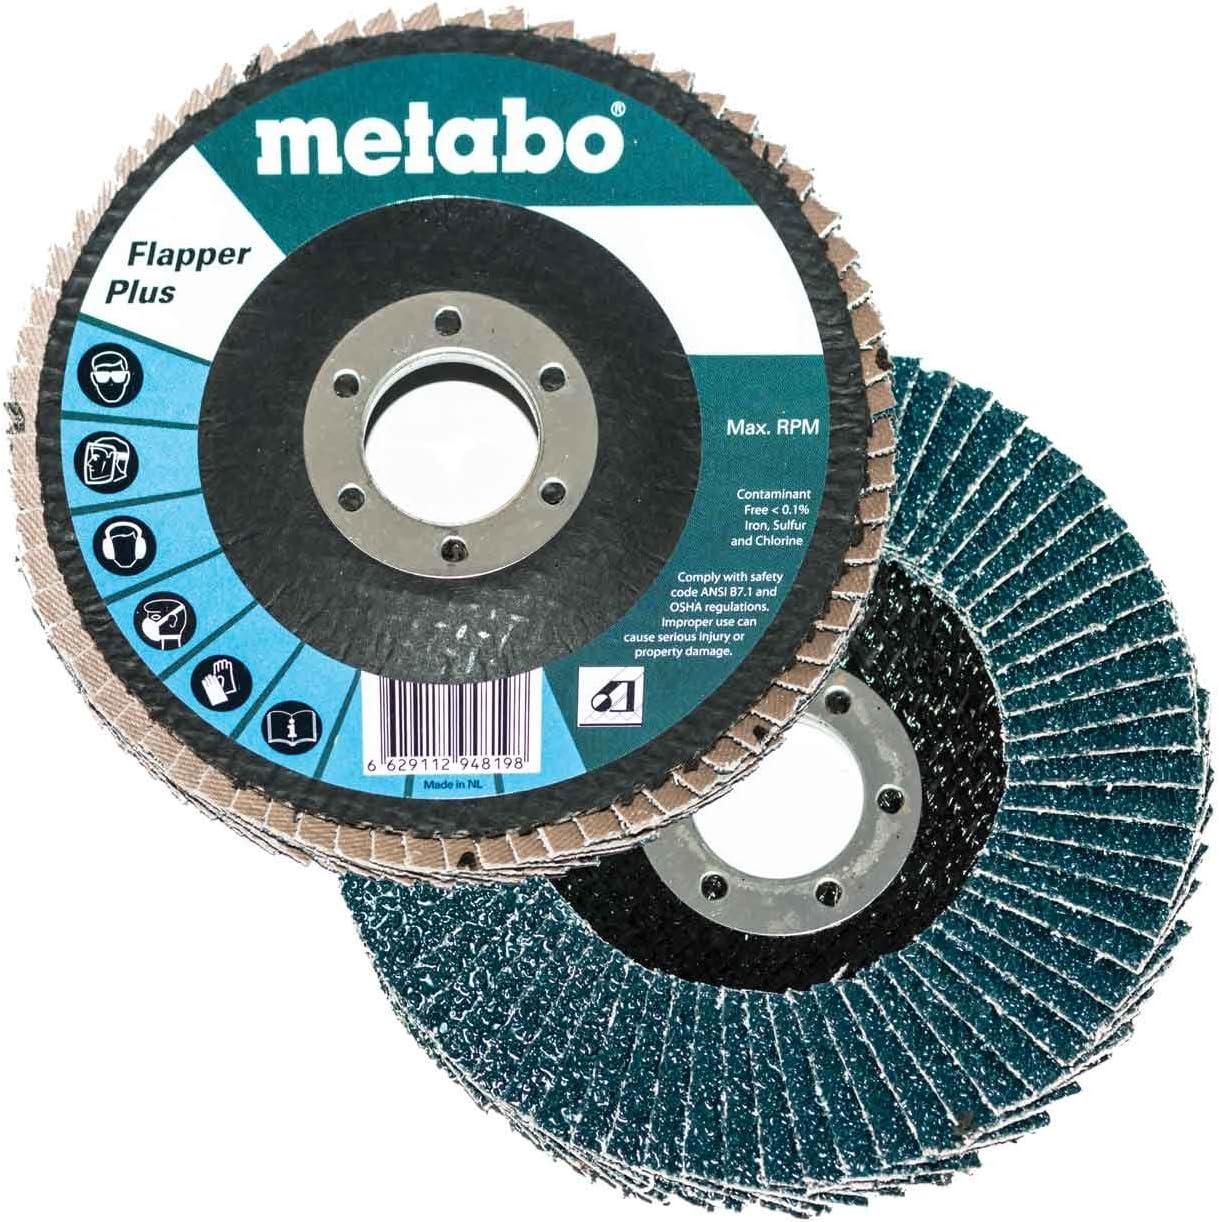 Metabo 629483000 4.5 x 7//8 Flapper Plus Abrasives Flap Discs 80 Grit 10 pack